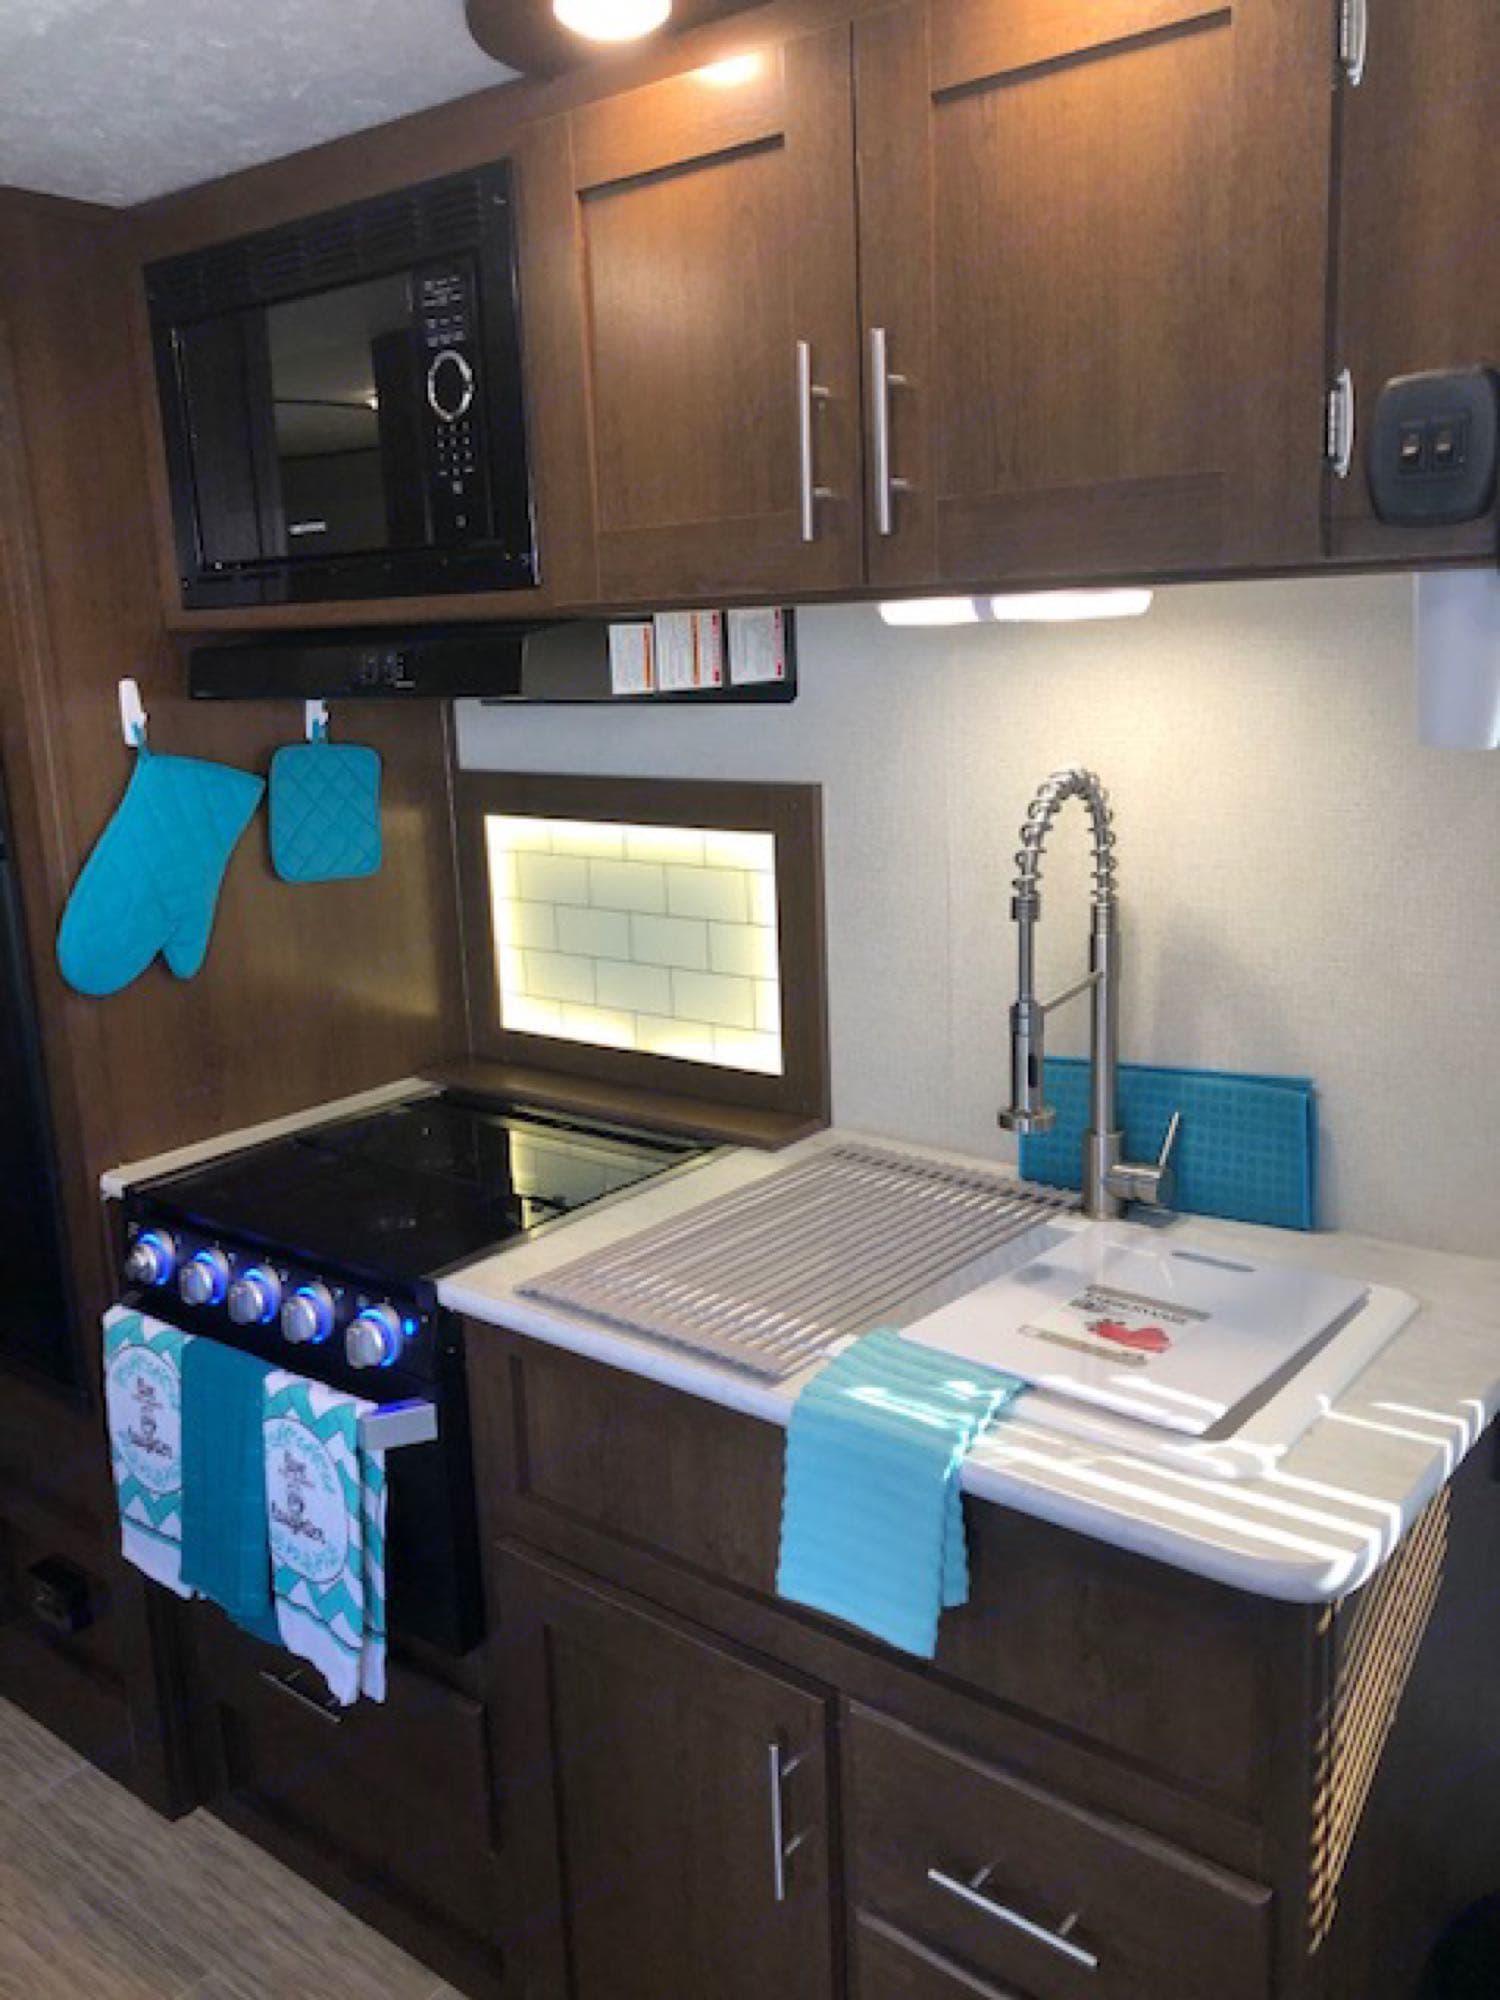 Kitchen area. Prime Time Avenger 2019